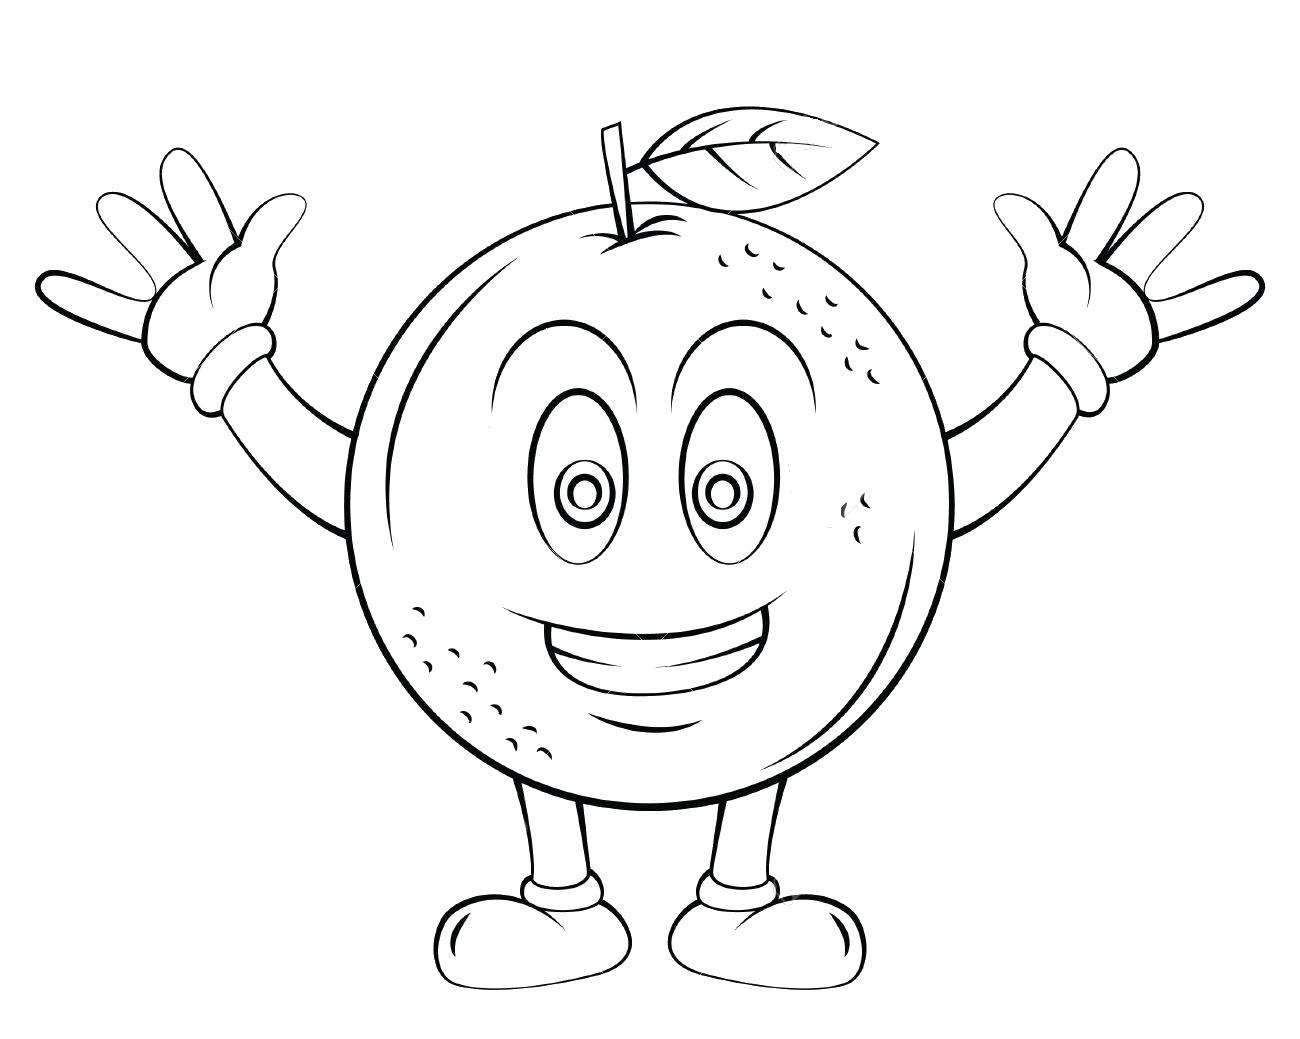 Orange Fruit Cartoon Coloring